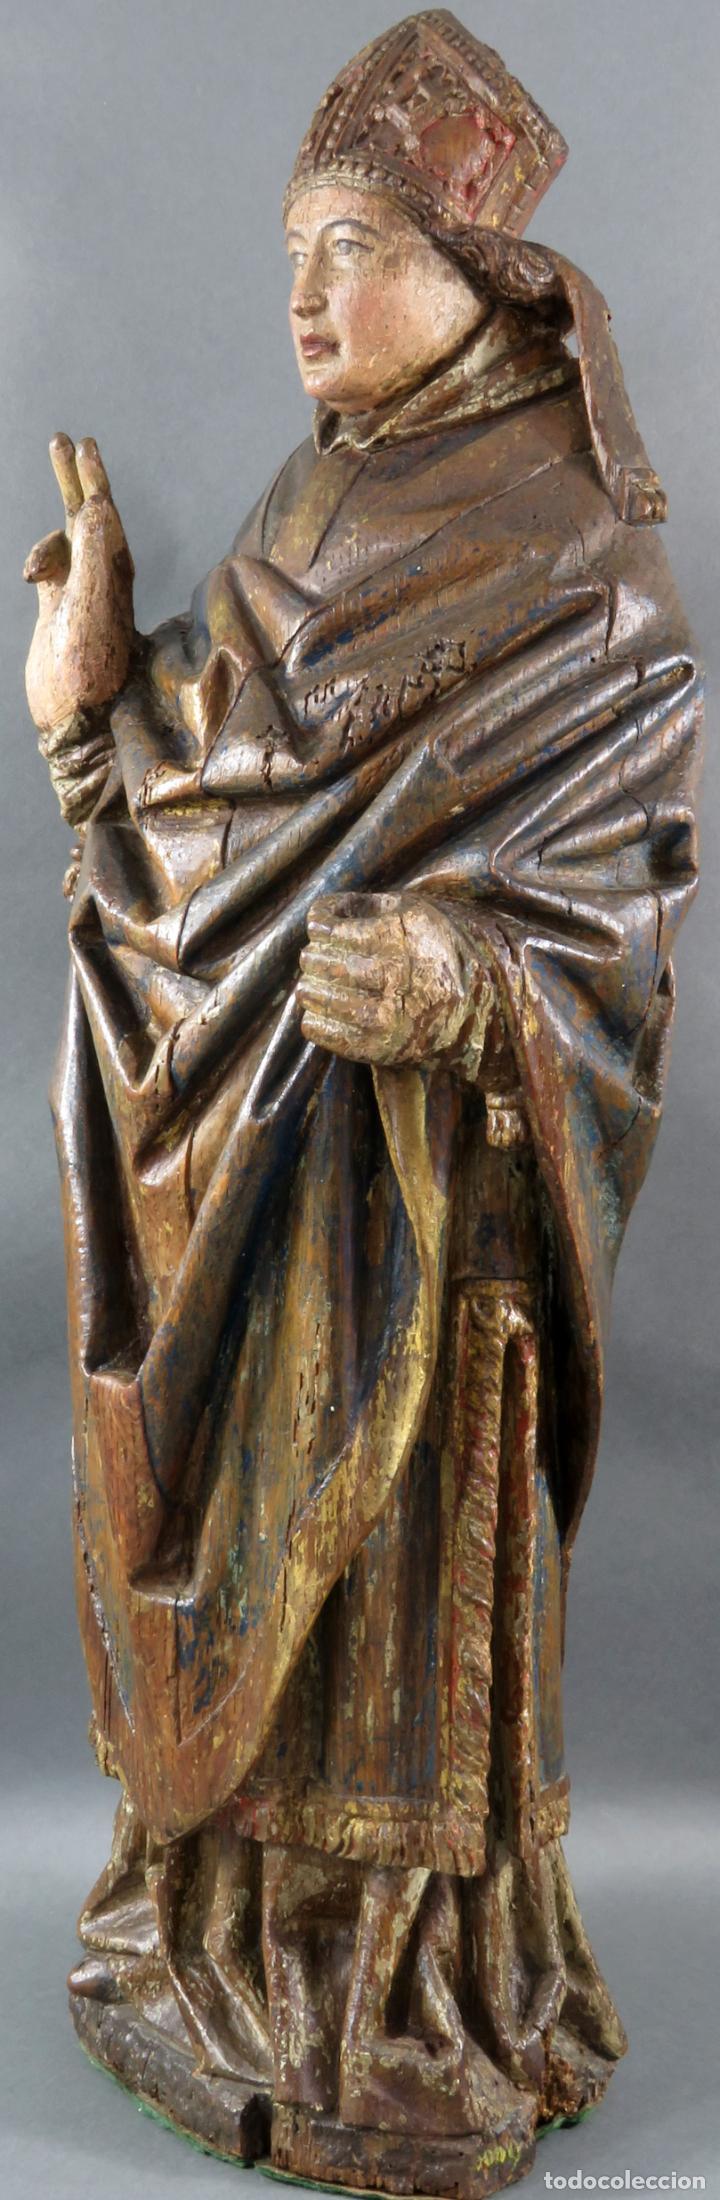 Arte: Talla obispo bendiciendo en madera tallada policromada circulo Alejo de Baiha principios siglo XVI - Foto 5 - 194787992